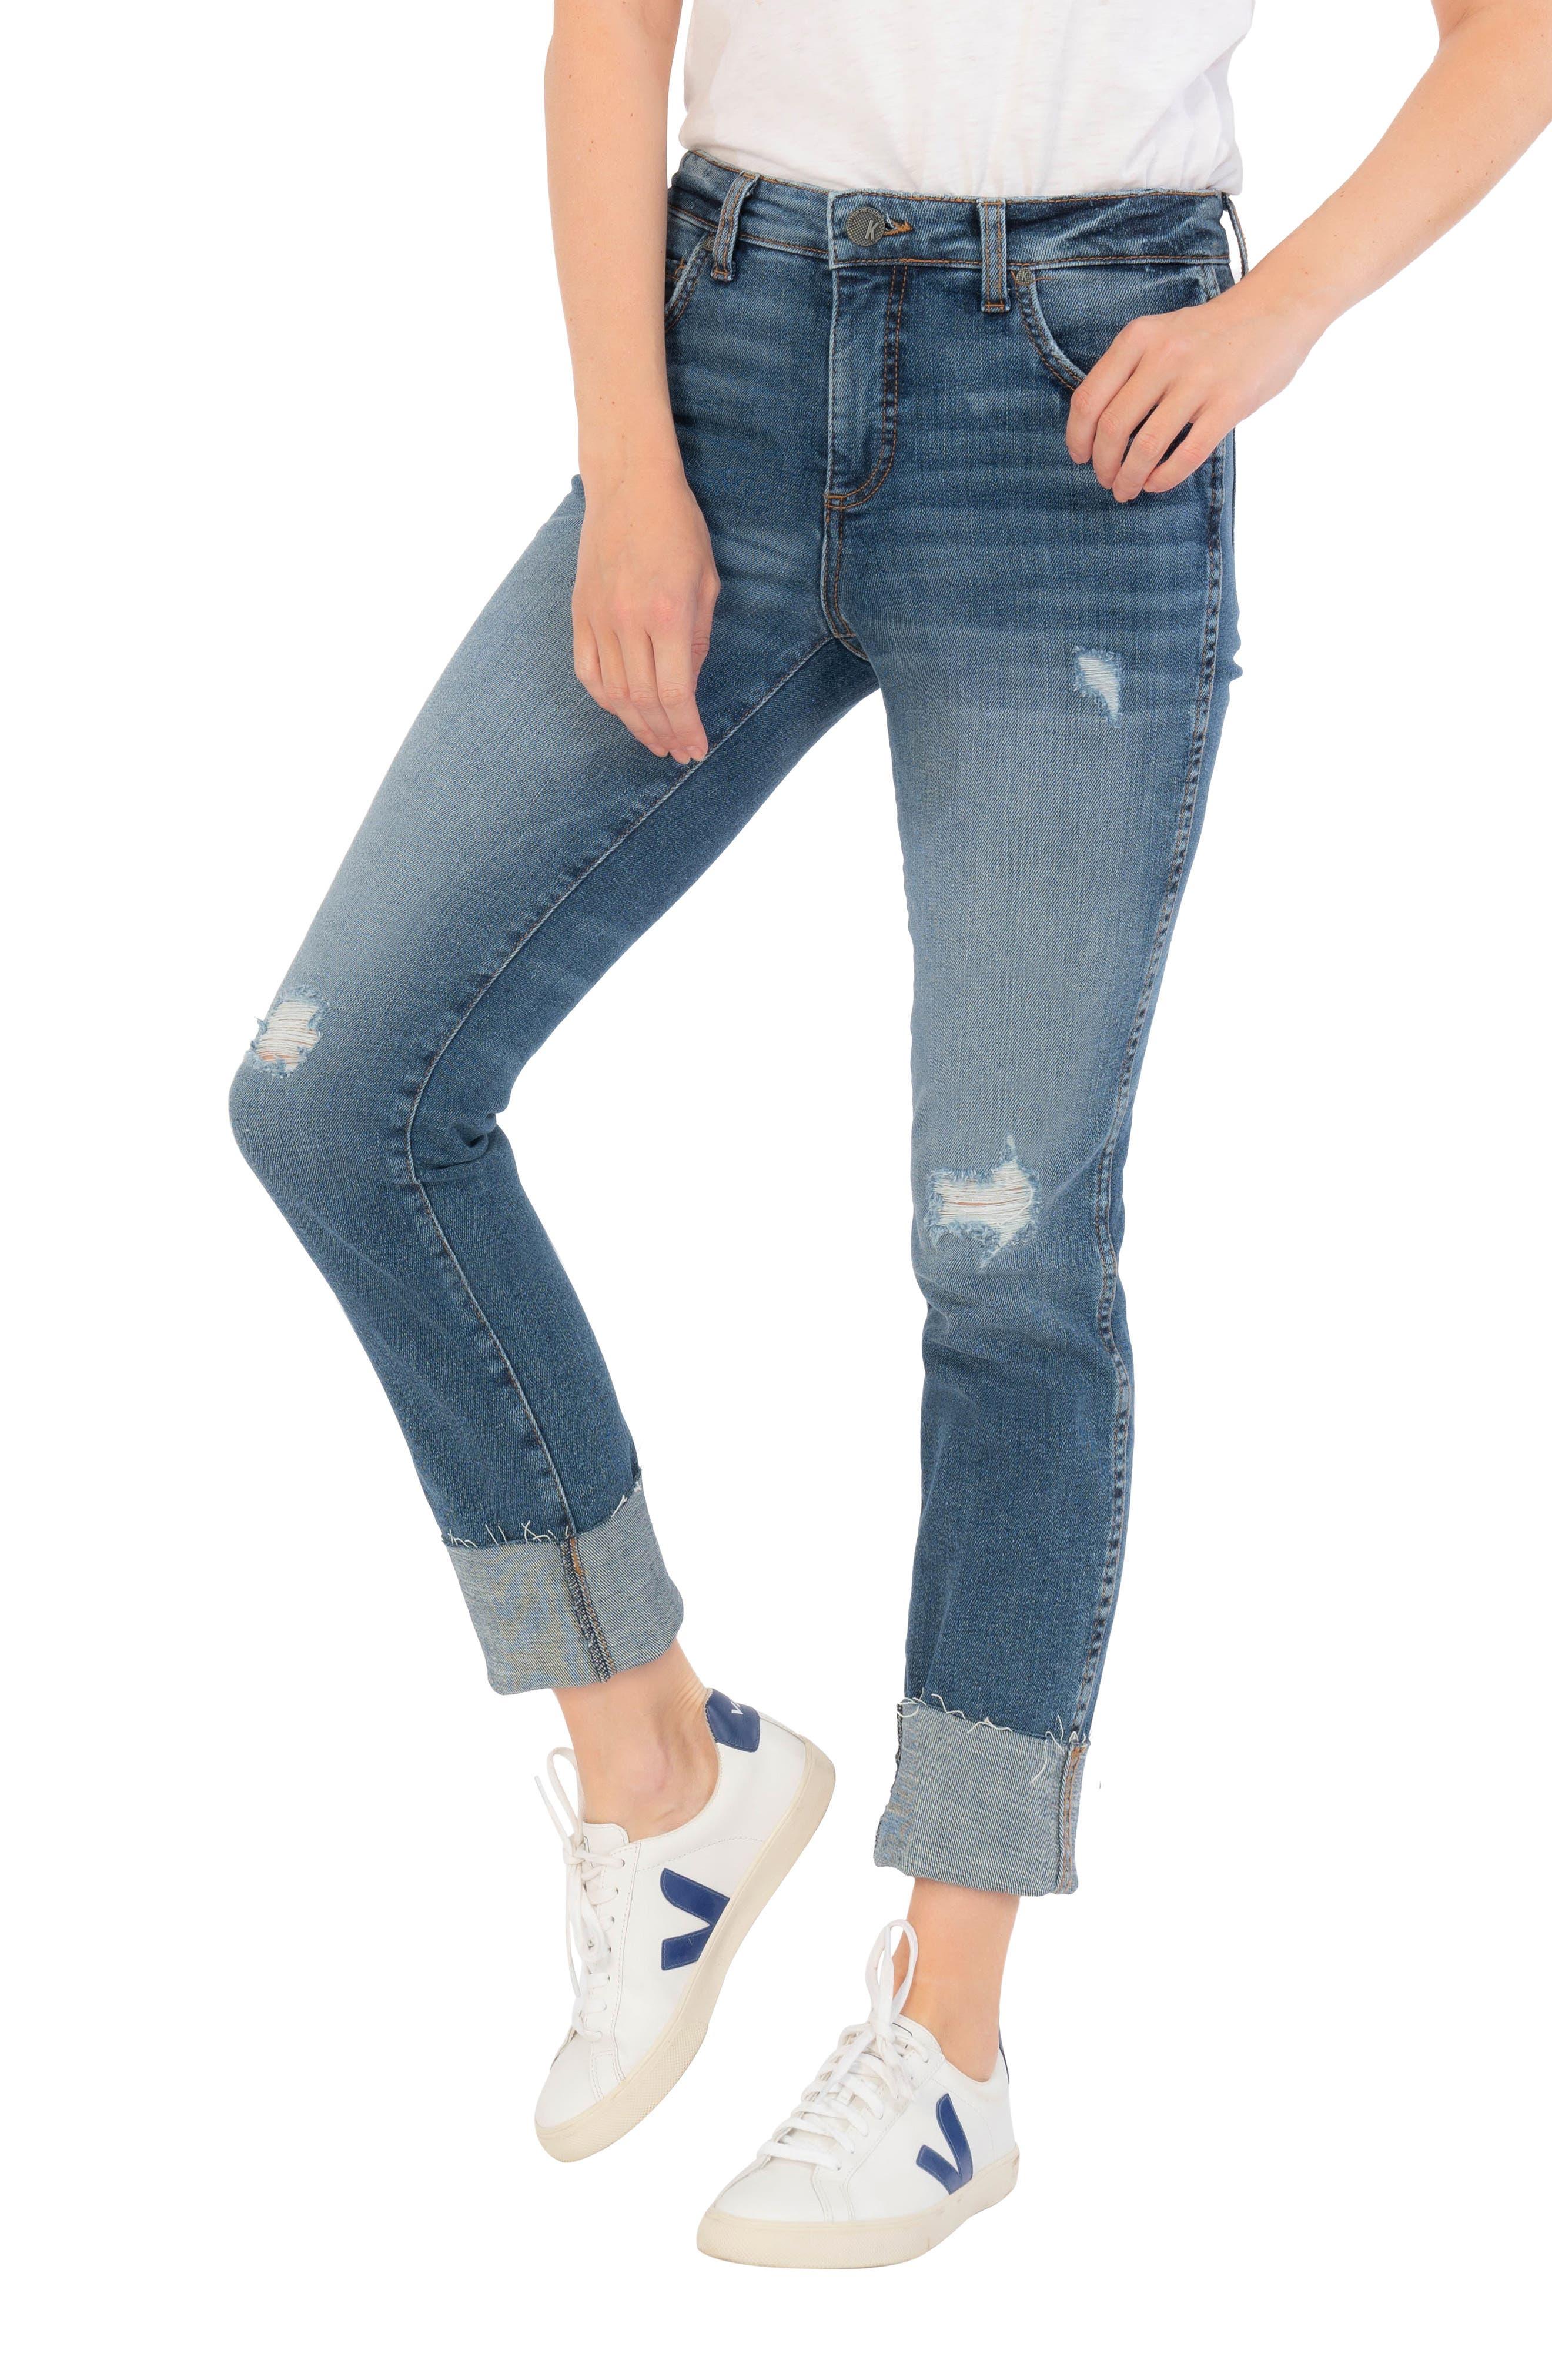 Catherine Ab Fab Ripped High Waist Boyfriend Jeans